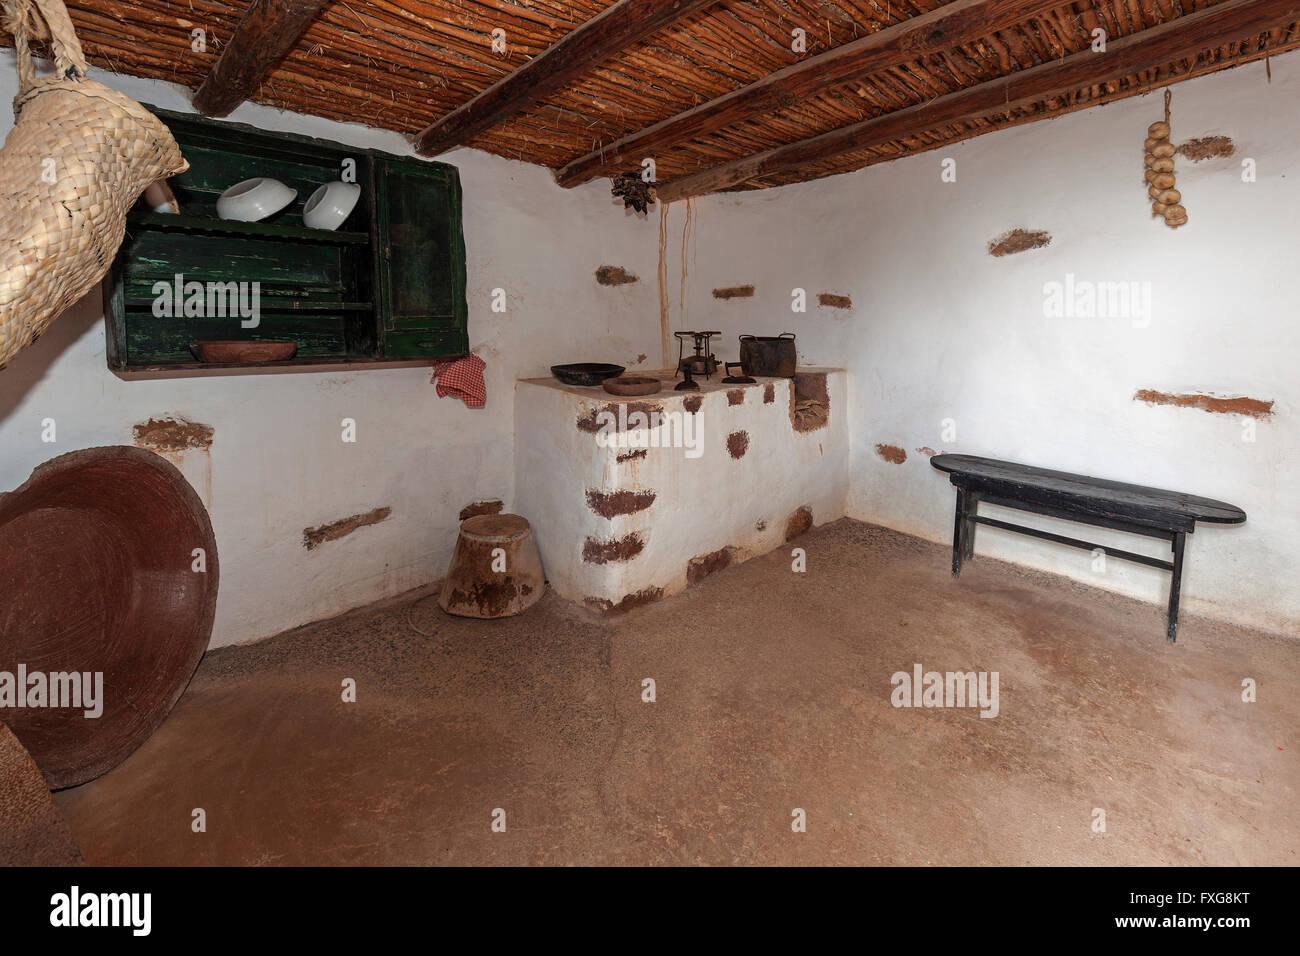 Kitchen, fire place in the open-air museum, Museum Village Ecomuseo de la Alcogida, Tefia, Fuerteventura, Canary - Stock Image